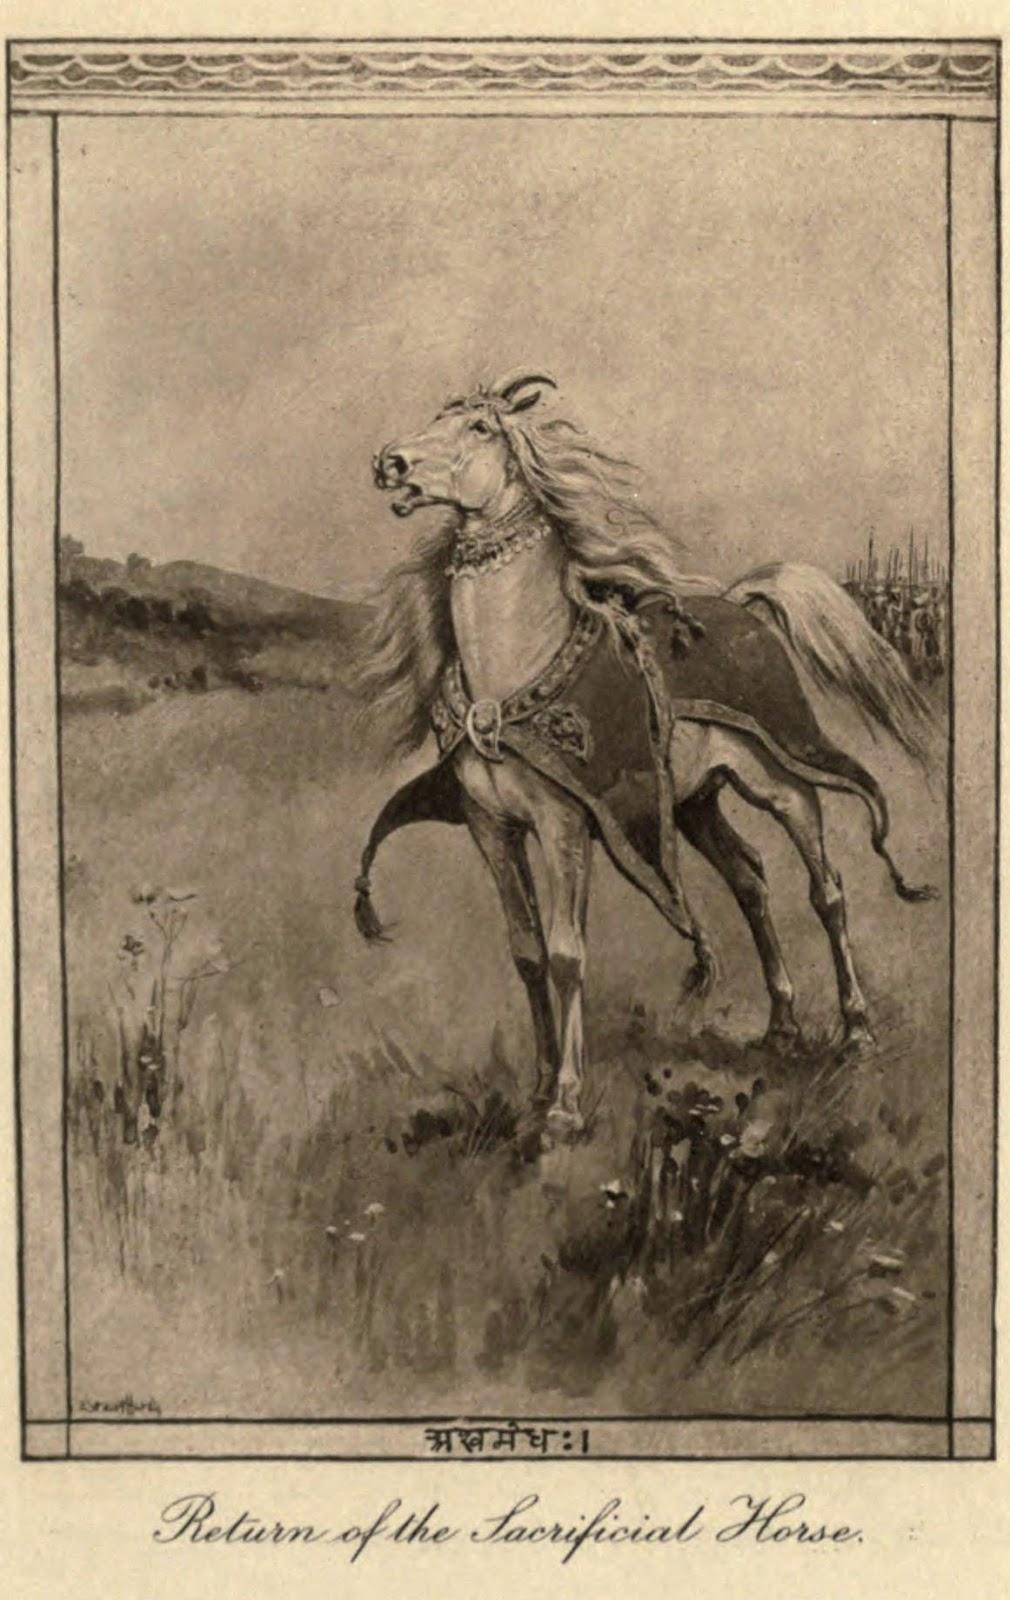 Return of the Sacrificial Horse